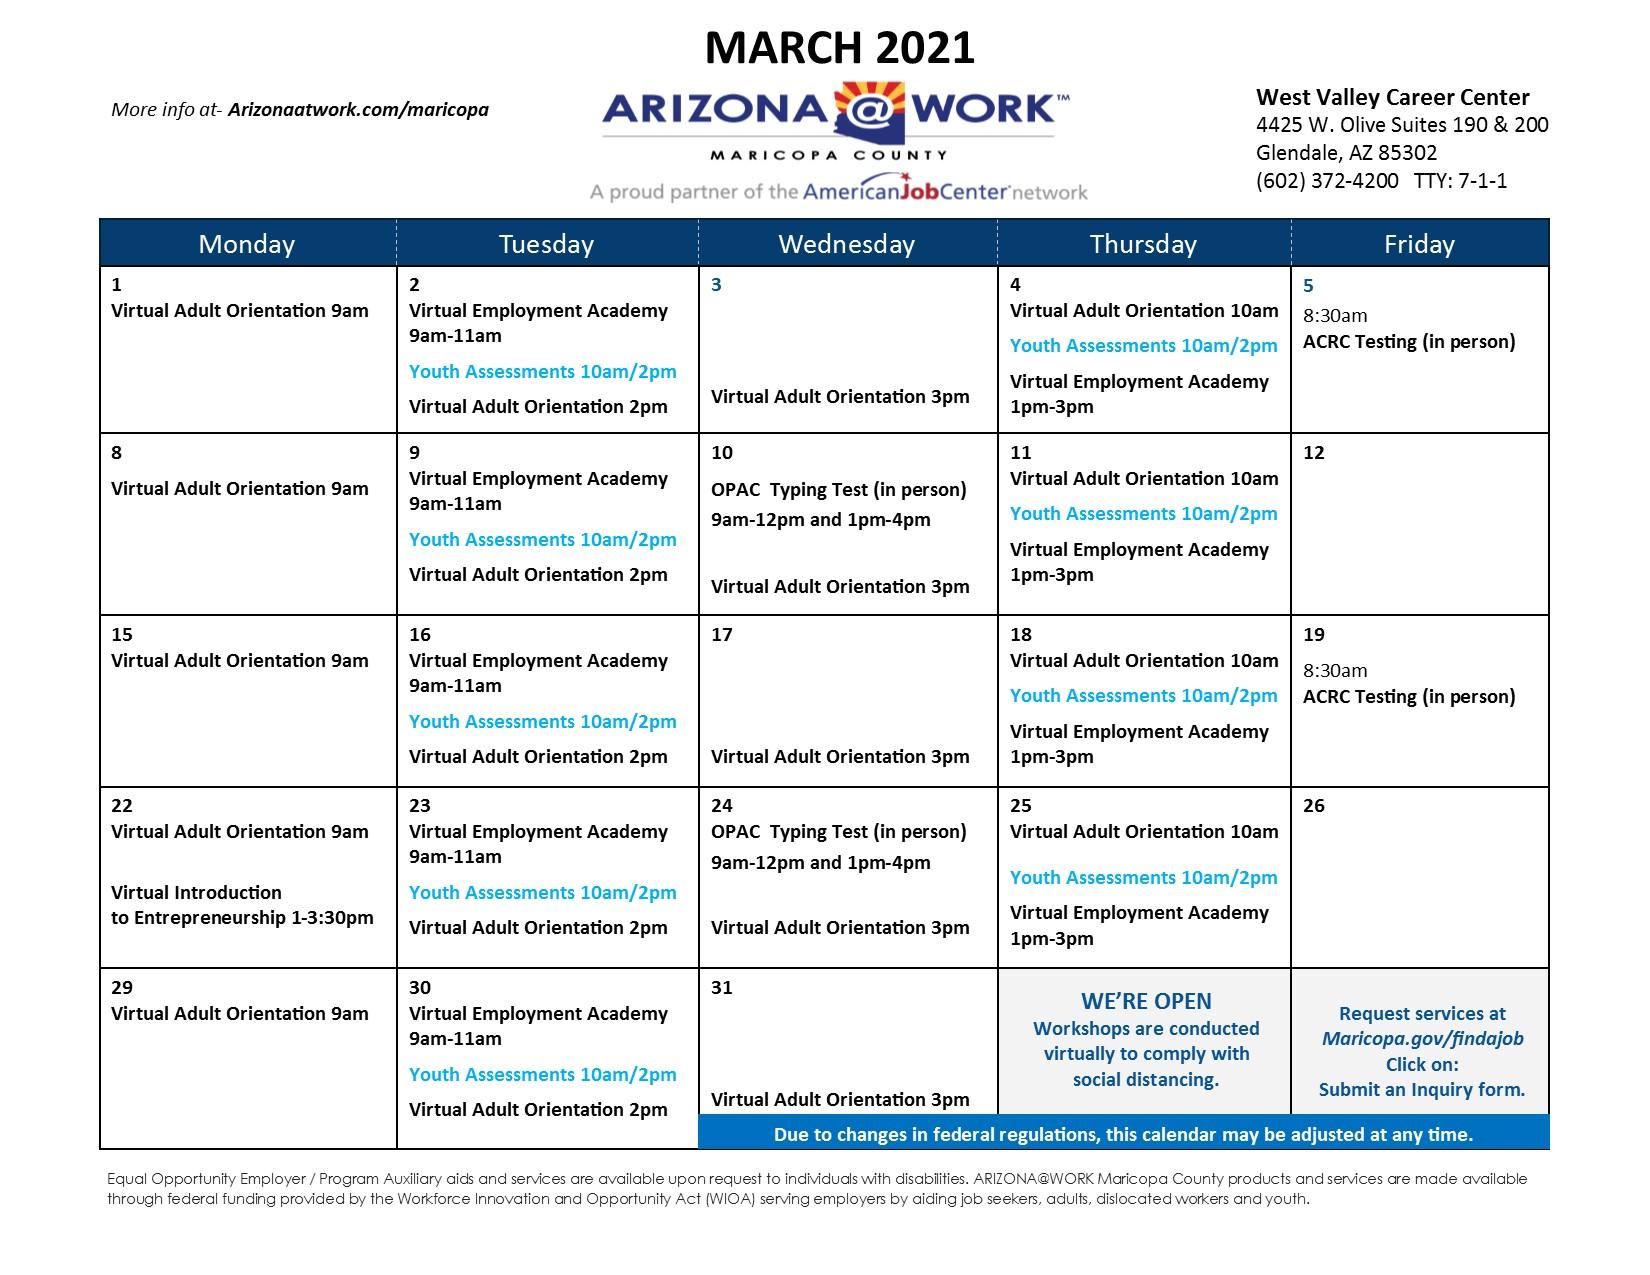 Maricopa County West Valley Center Calendar March 2021